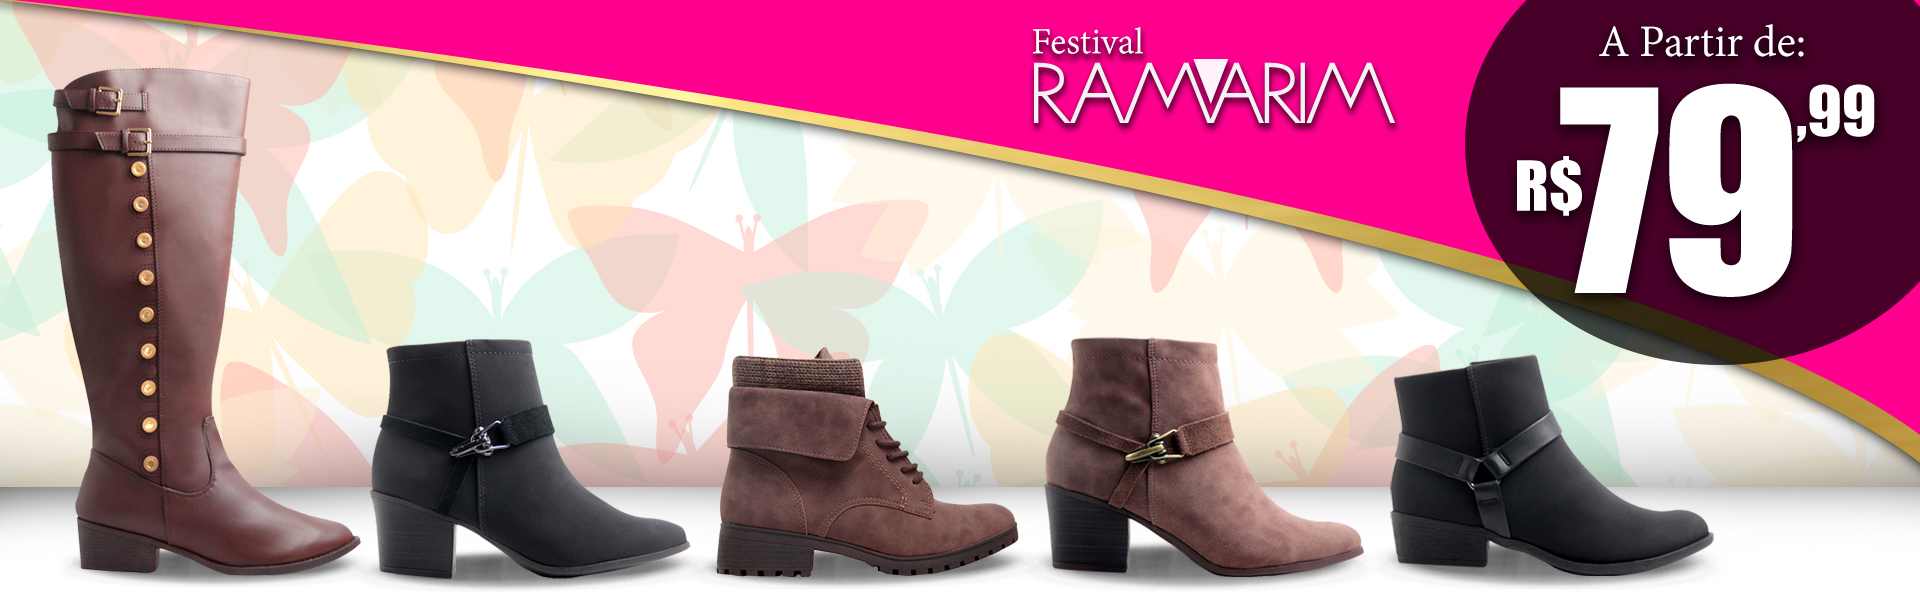 Festival ramarim